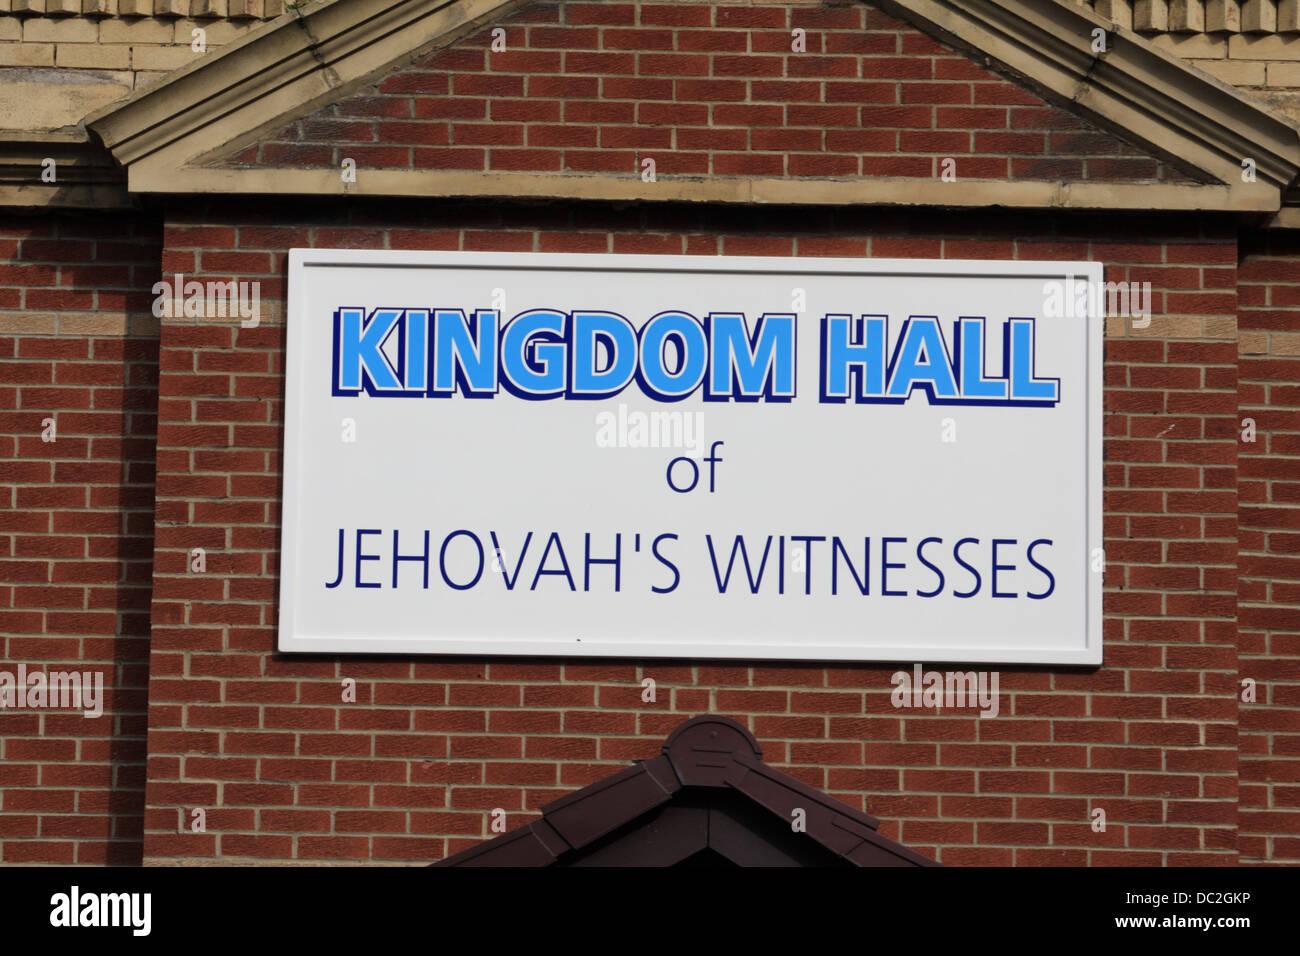 Kingdom Hall of Jehovah's witnesses, Sunderland, UK. - Stock Image